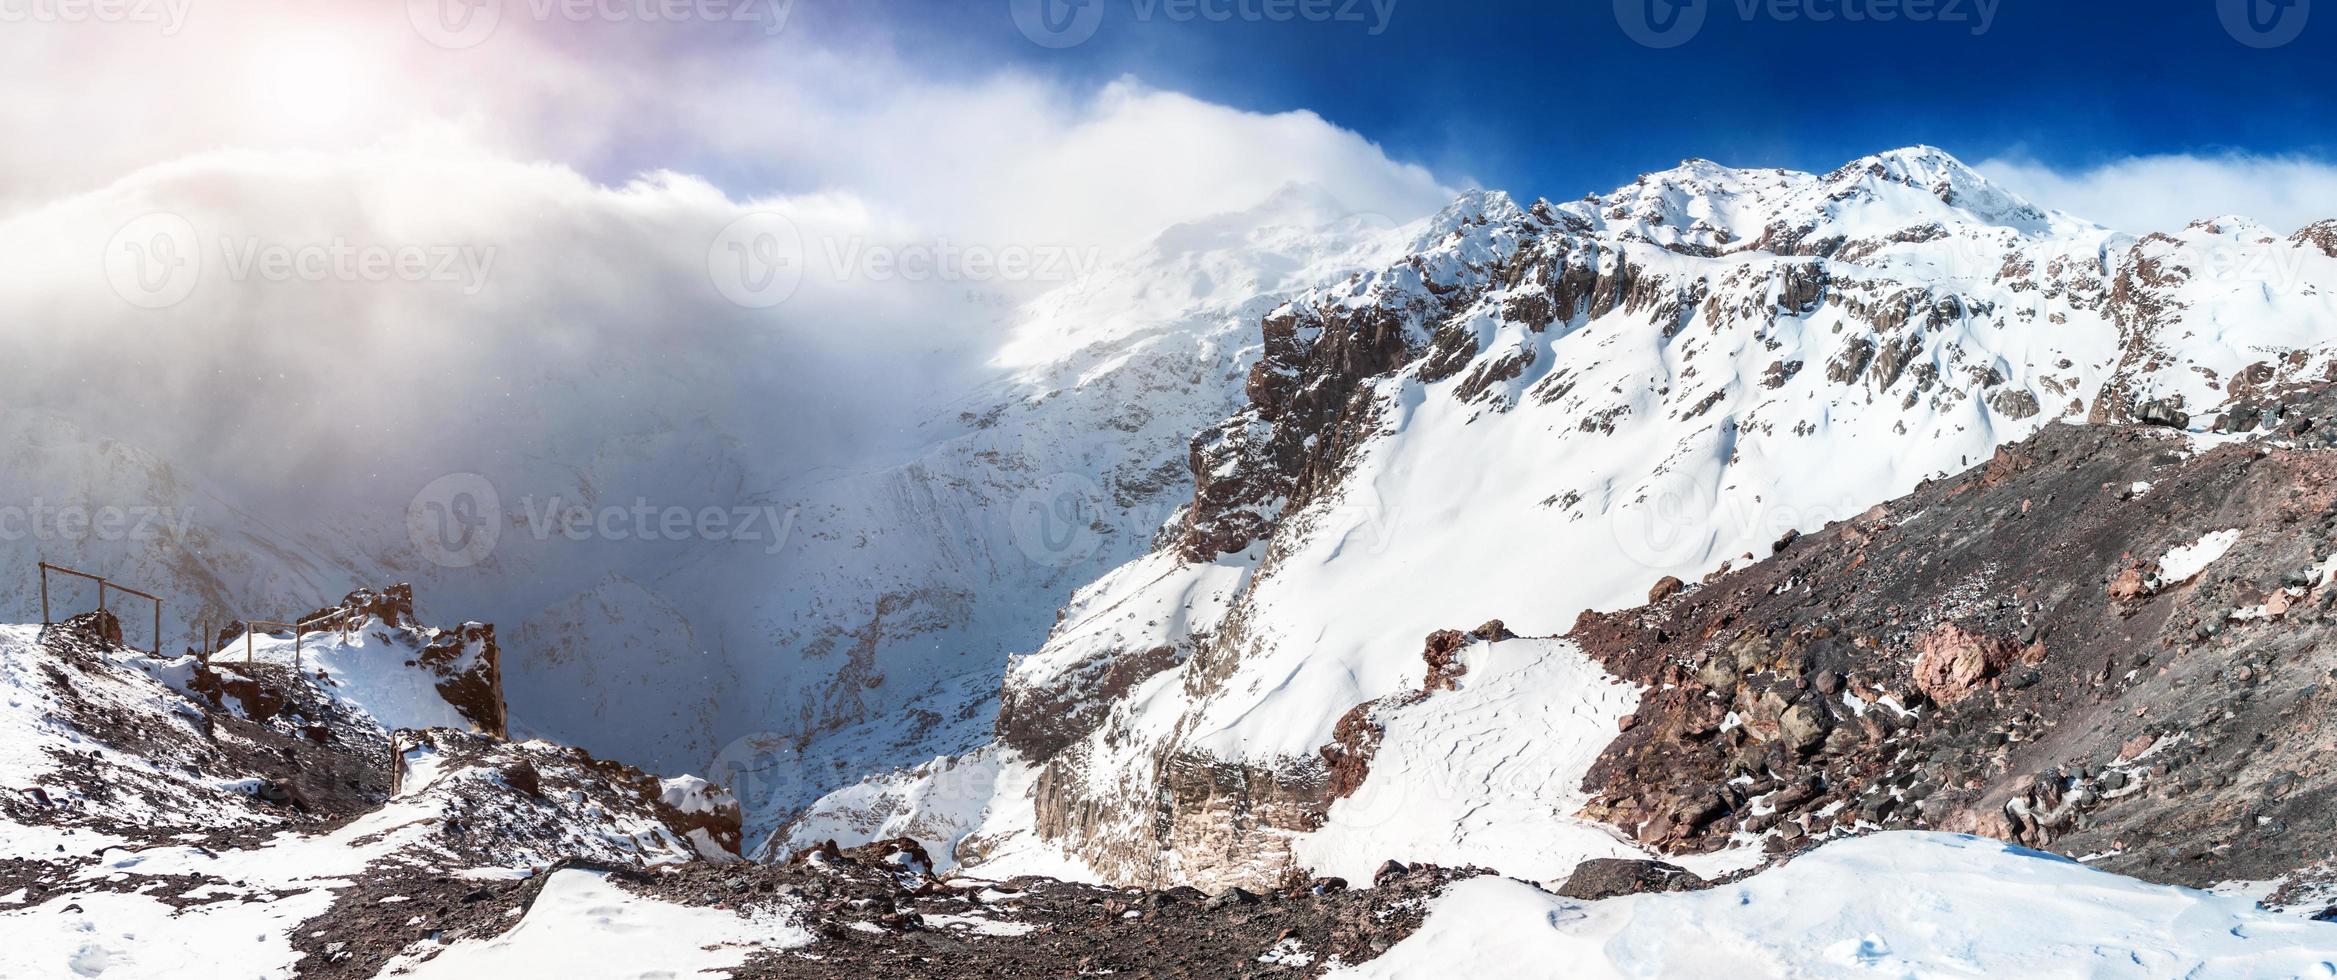 panorama över snötäckta berg foto